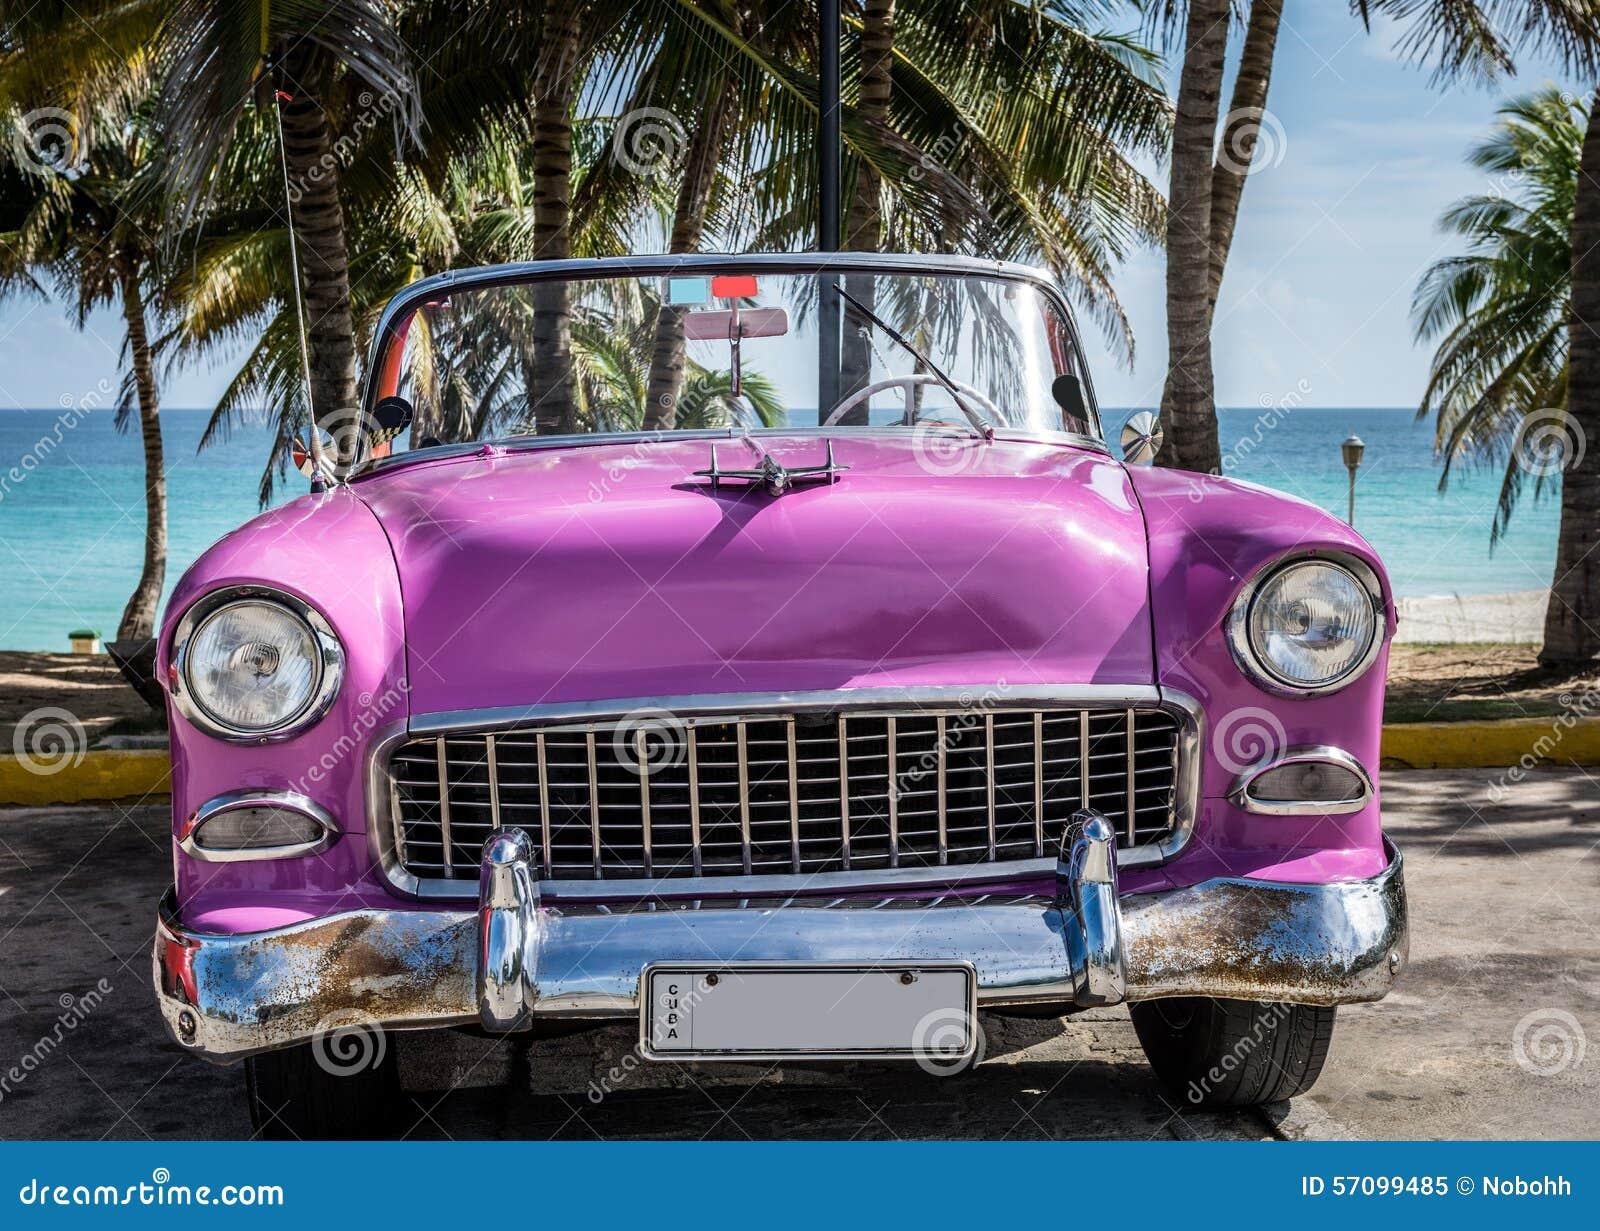 NEW Knapford Station Background By JamesFan1991 548212935 besides Chogokin Eva 00 additionally Stock Photo Beautiful Girl Stylish White Sports Car Image17538290 likewise Stock Photo Apartment Windows Image7526680 as well Stock Image Classic American Sports Car Image4314081. on old cars in 2d